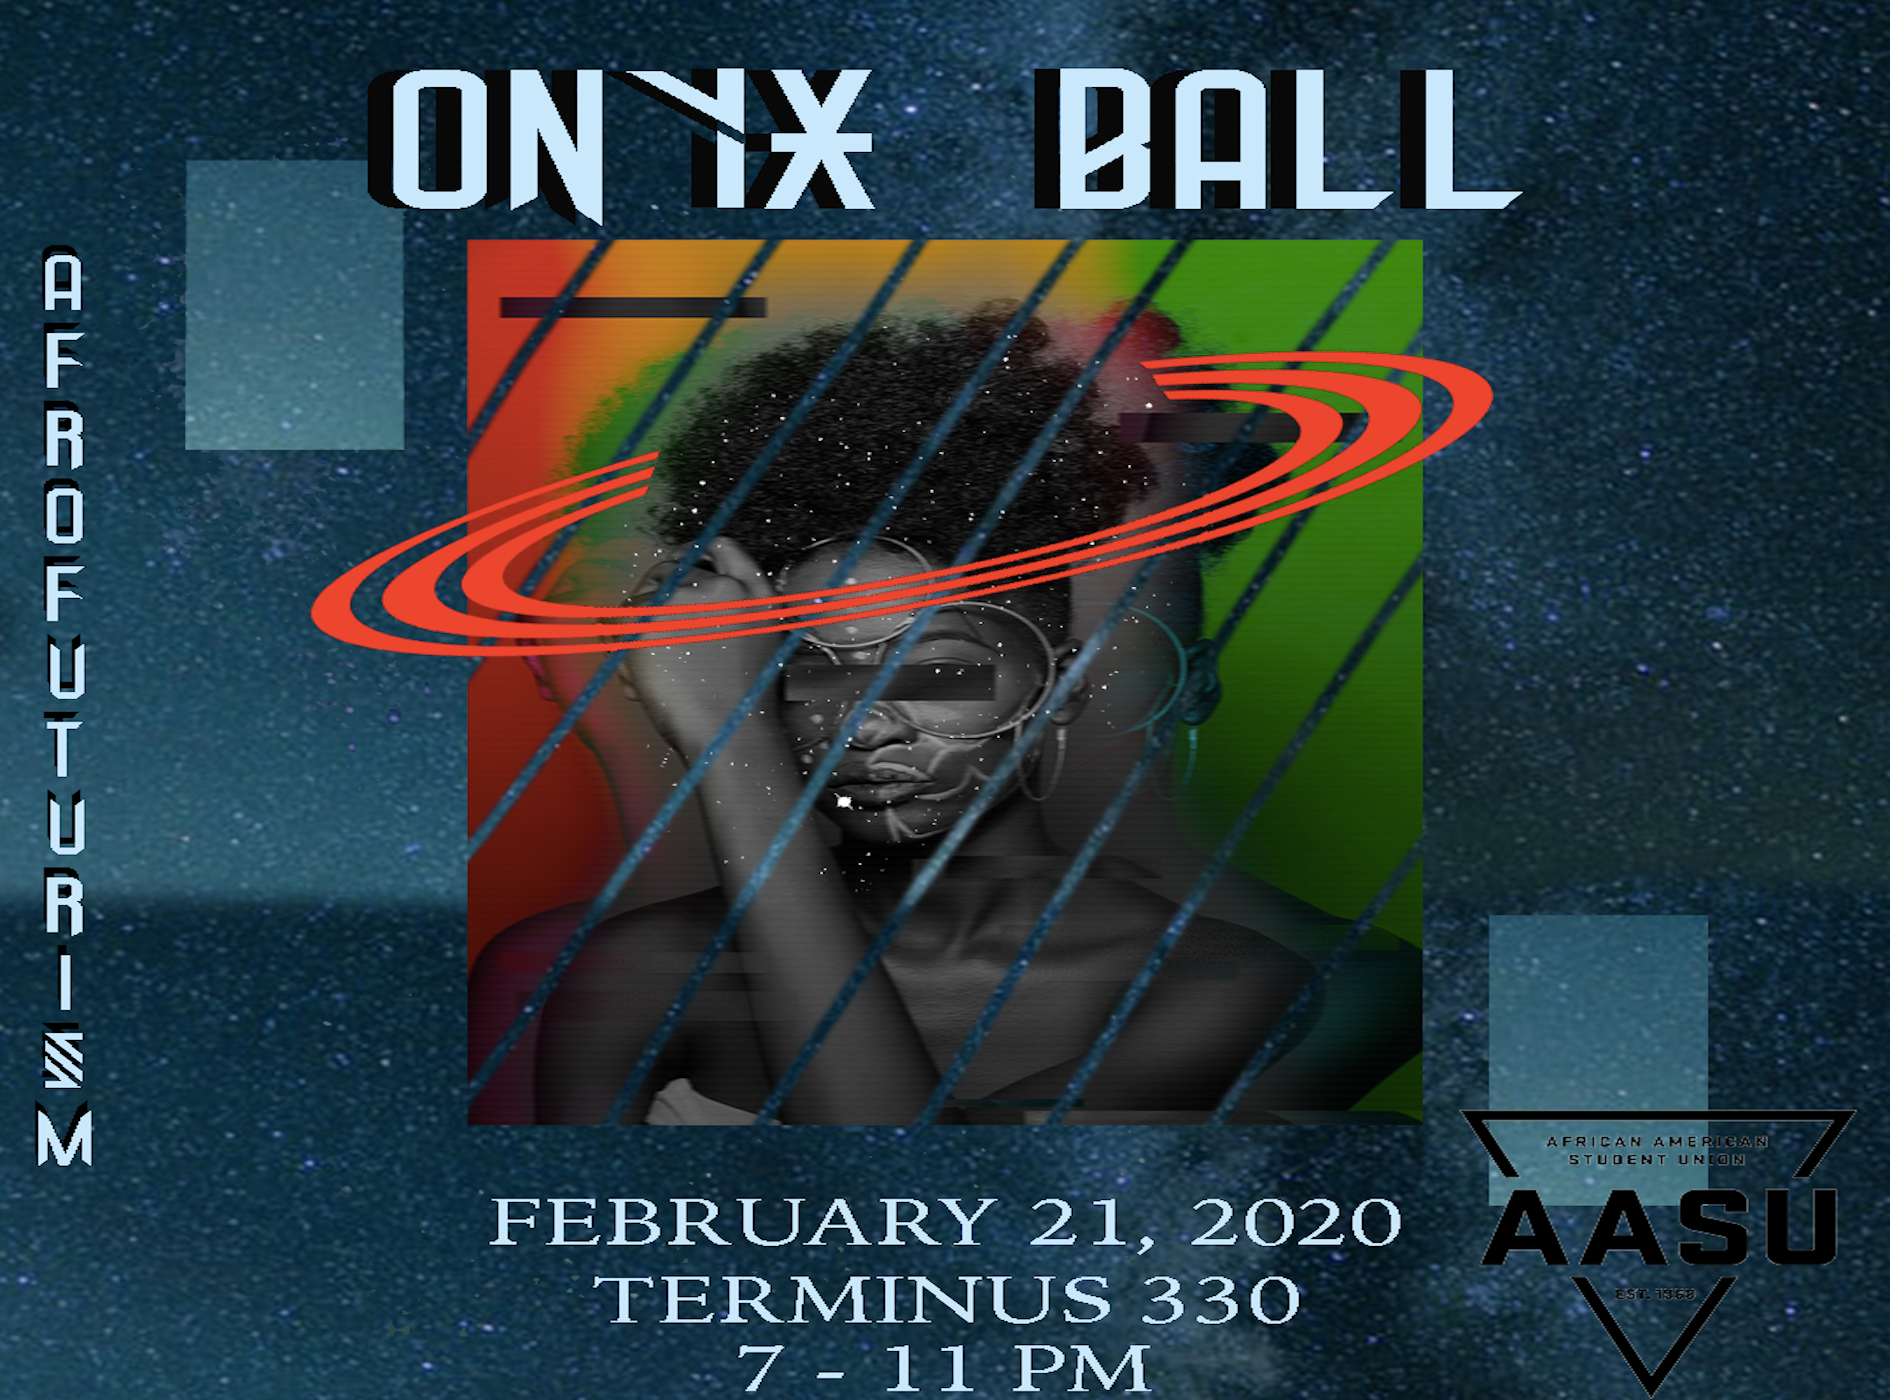 Onyx Ball 2020